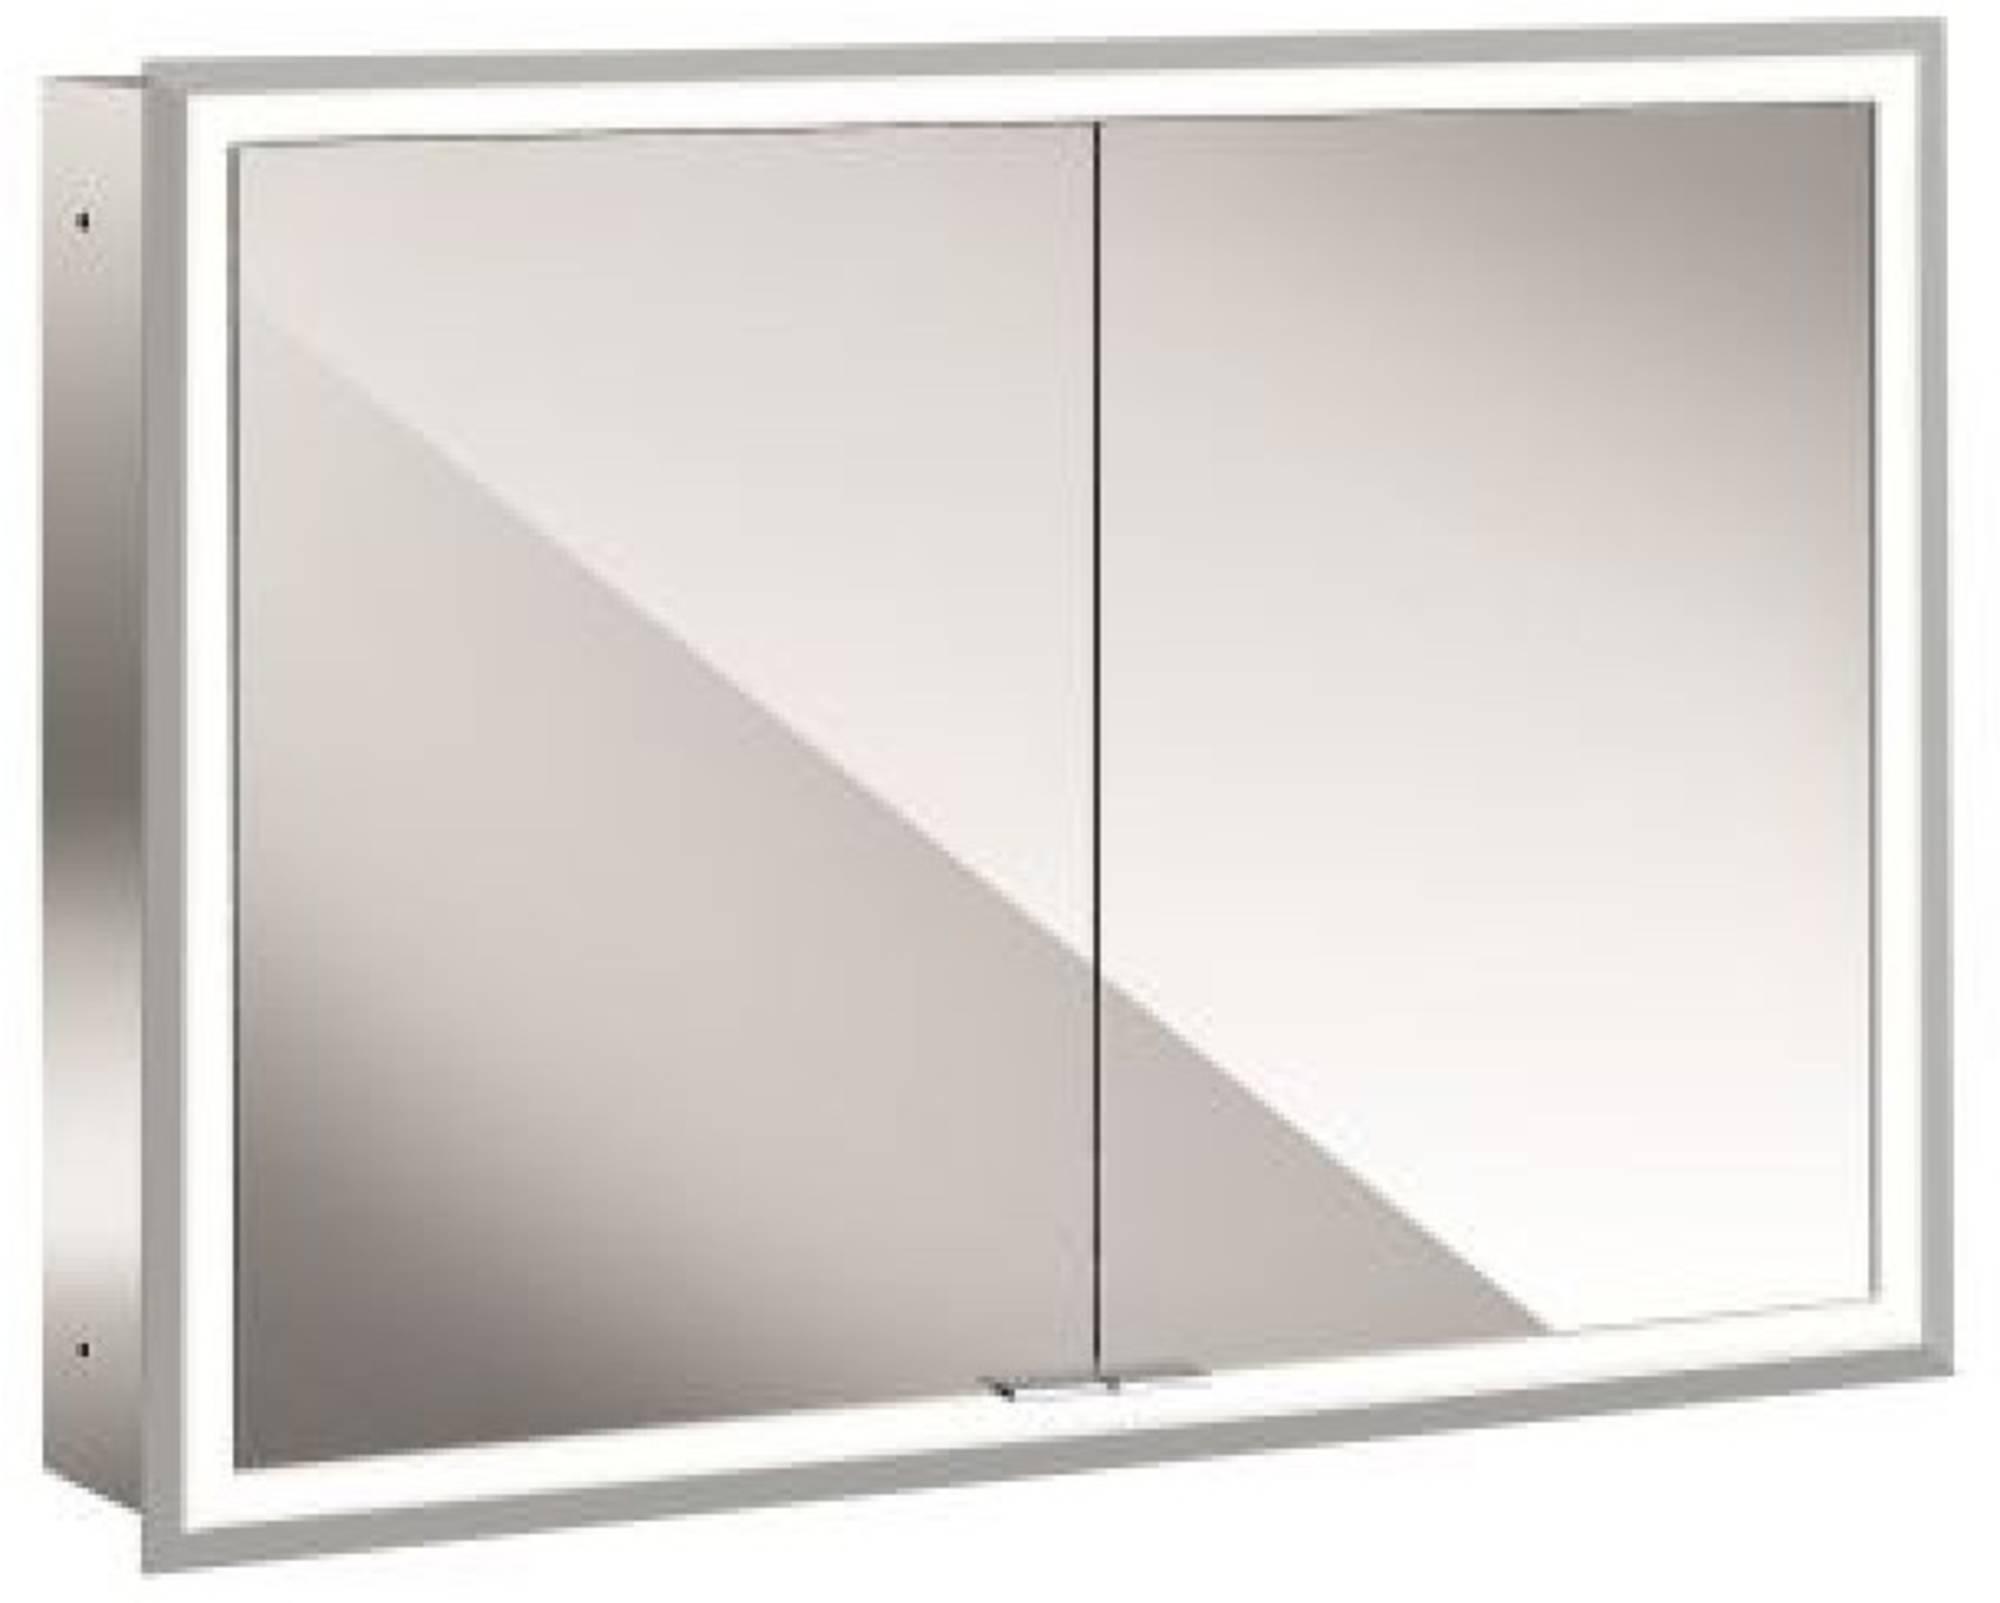 Emco Asis Prime inbouw spiegelkast met led verlichting 103x73 cm wit glas